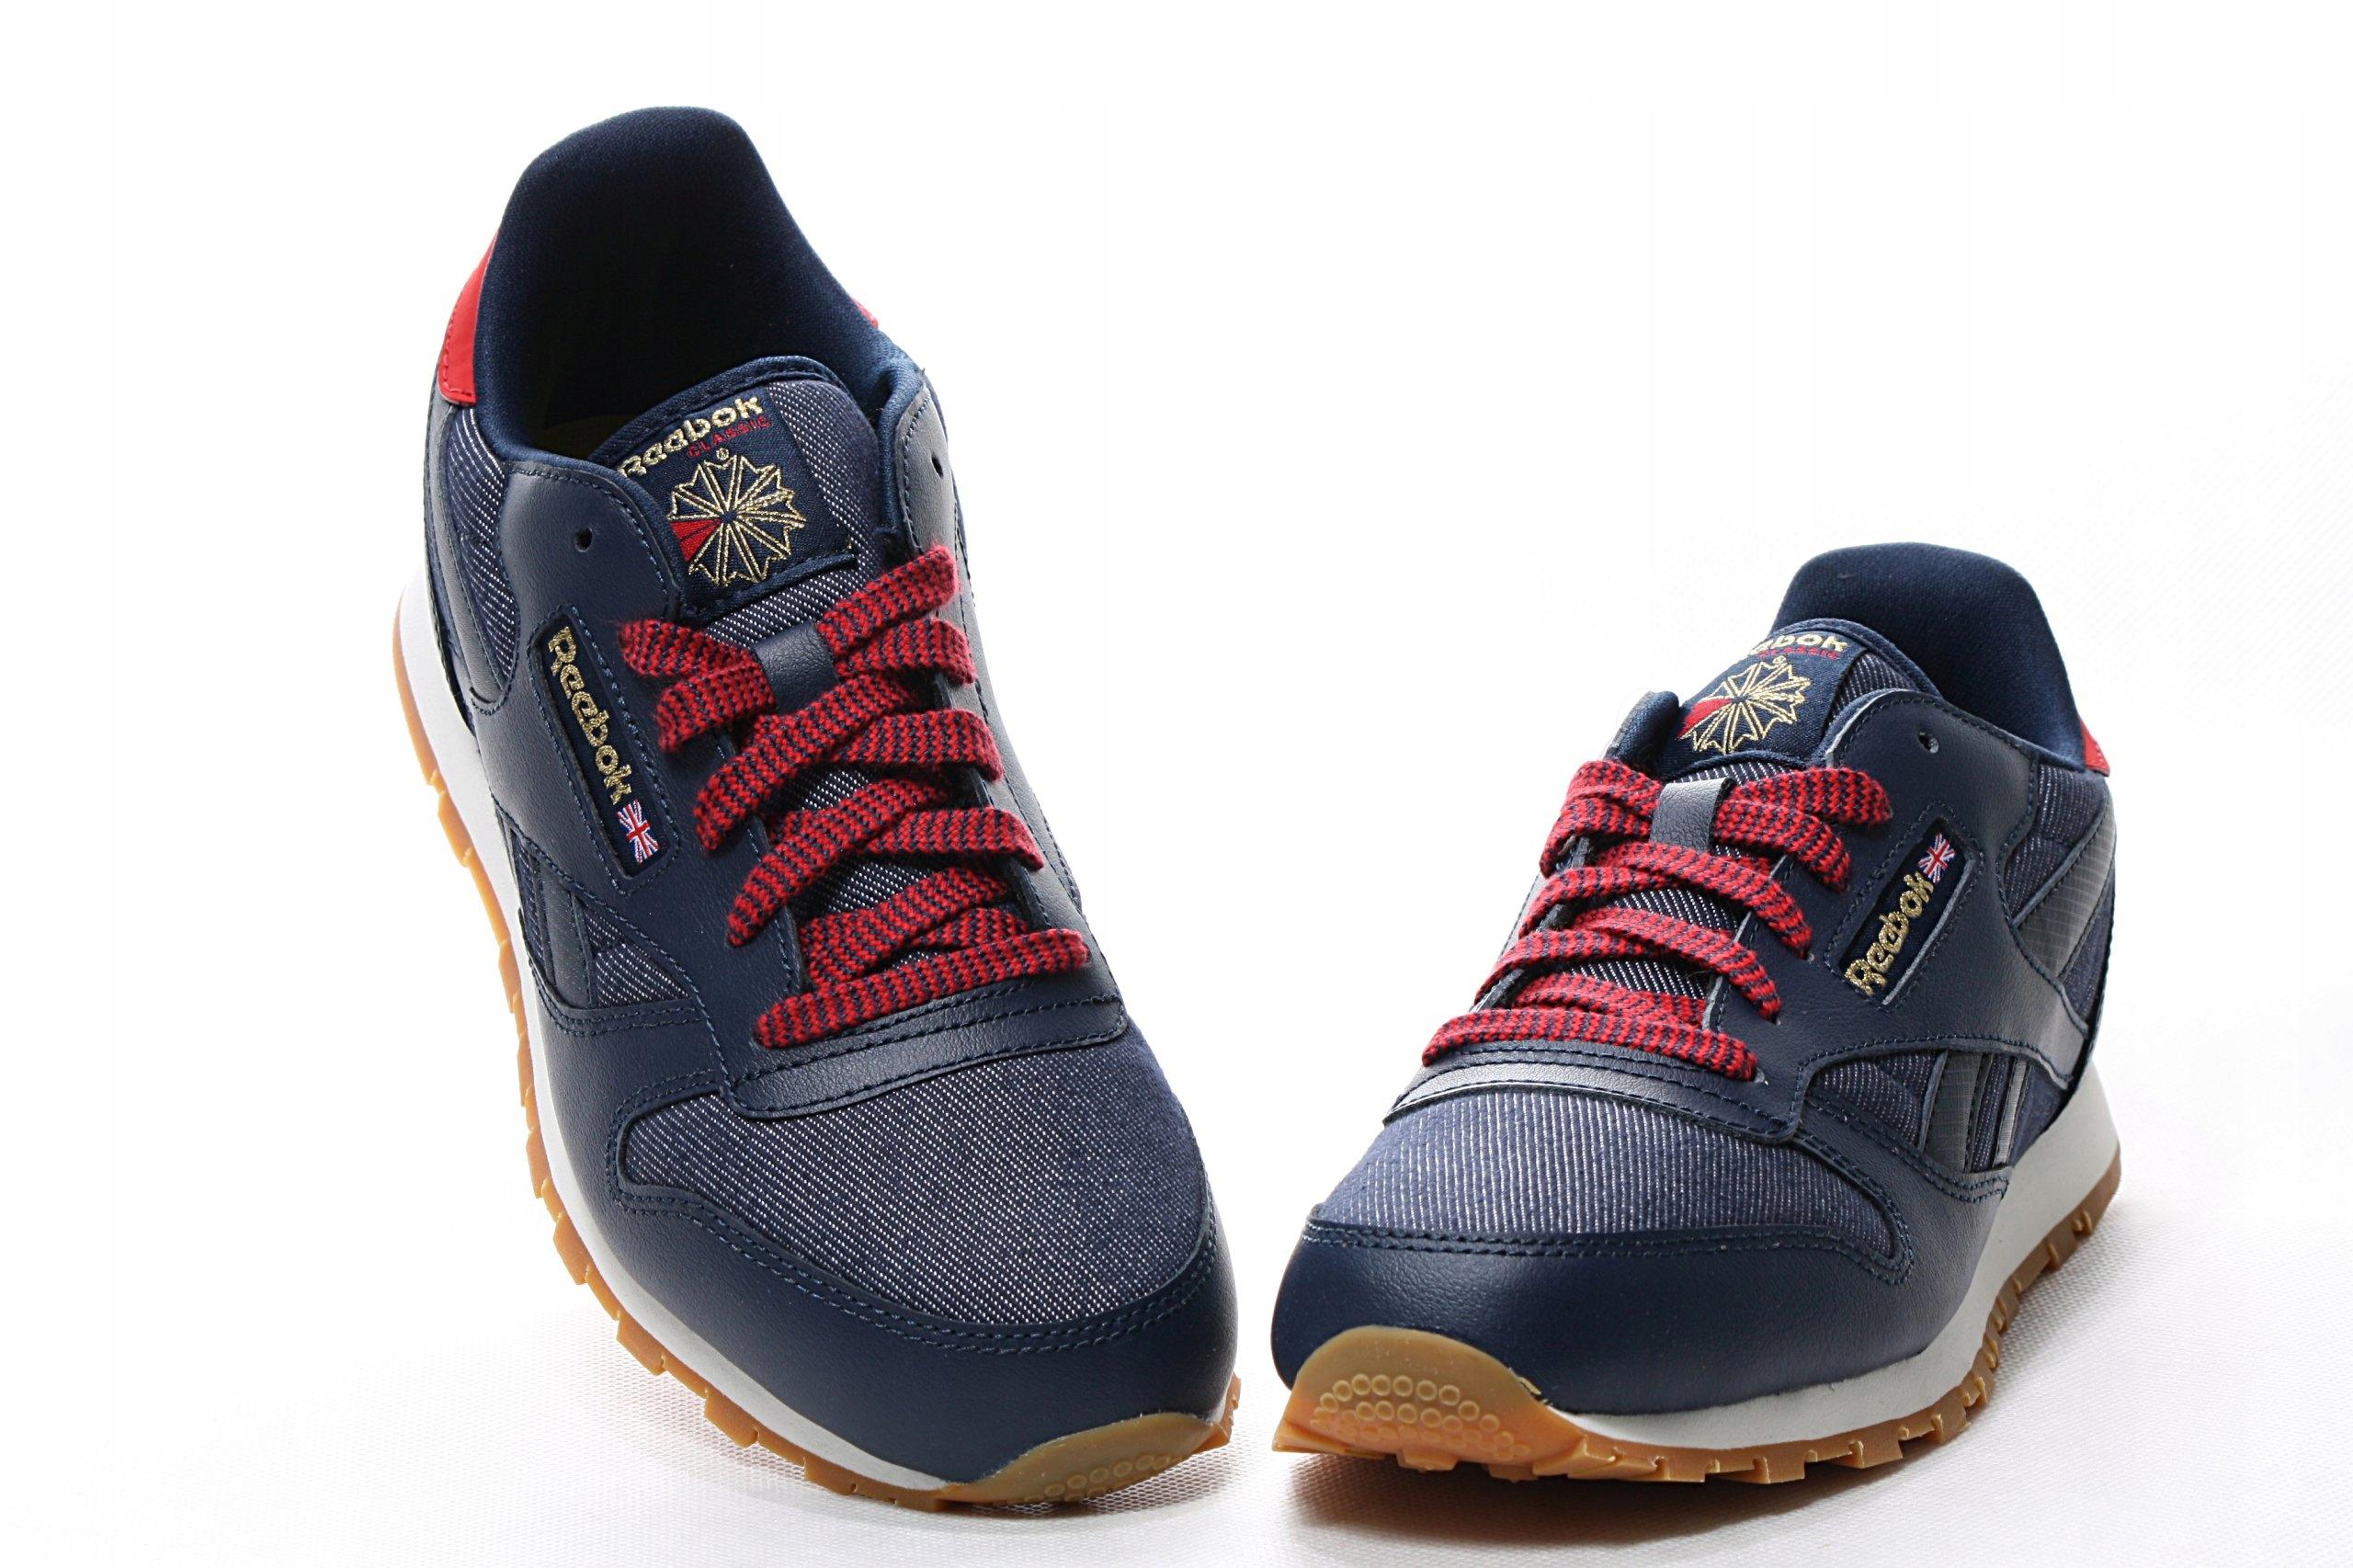 43005b2c Buty damskie Reebok Classic Leather DG(AR2042)35 - 6895923926 ...